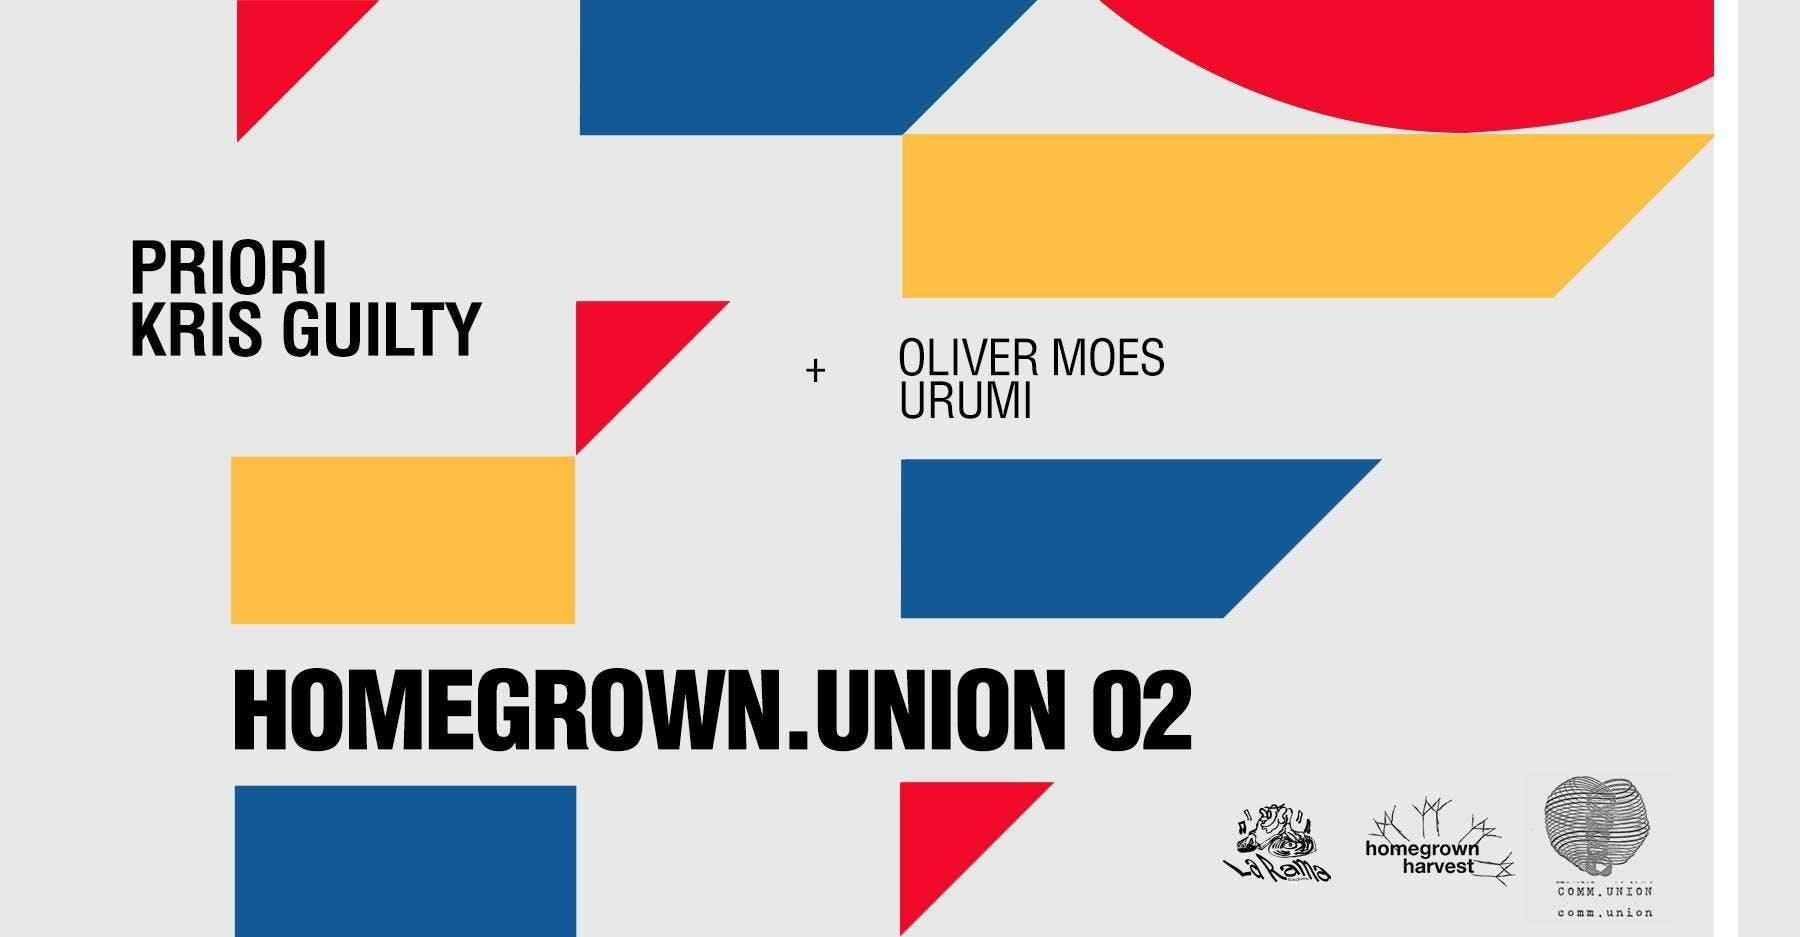 Homegrown.Union 02 w/ Priori & Kris Guilty